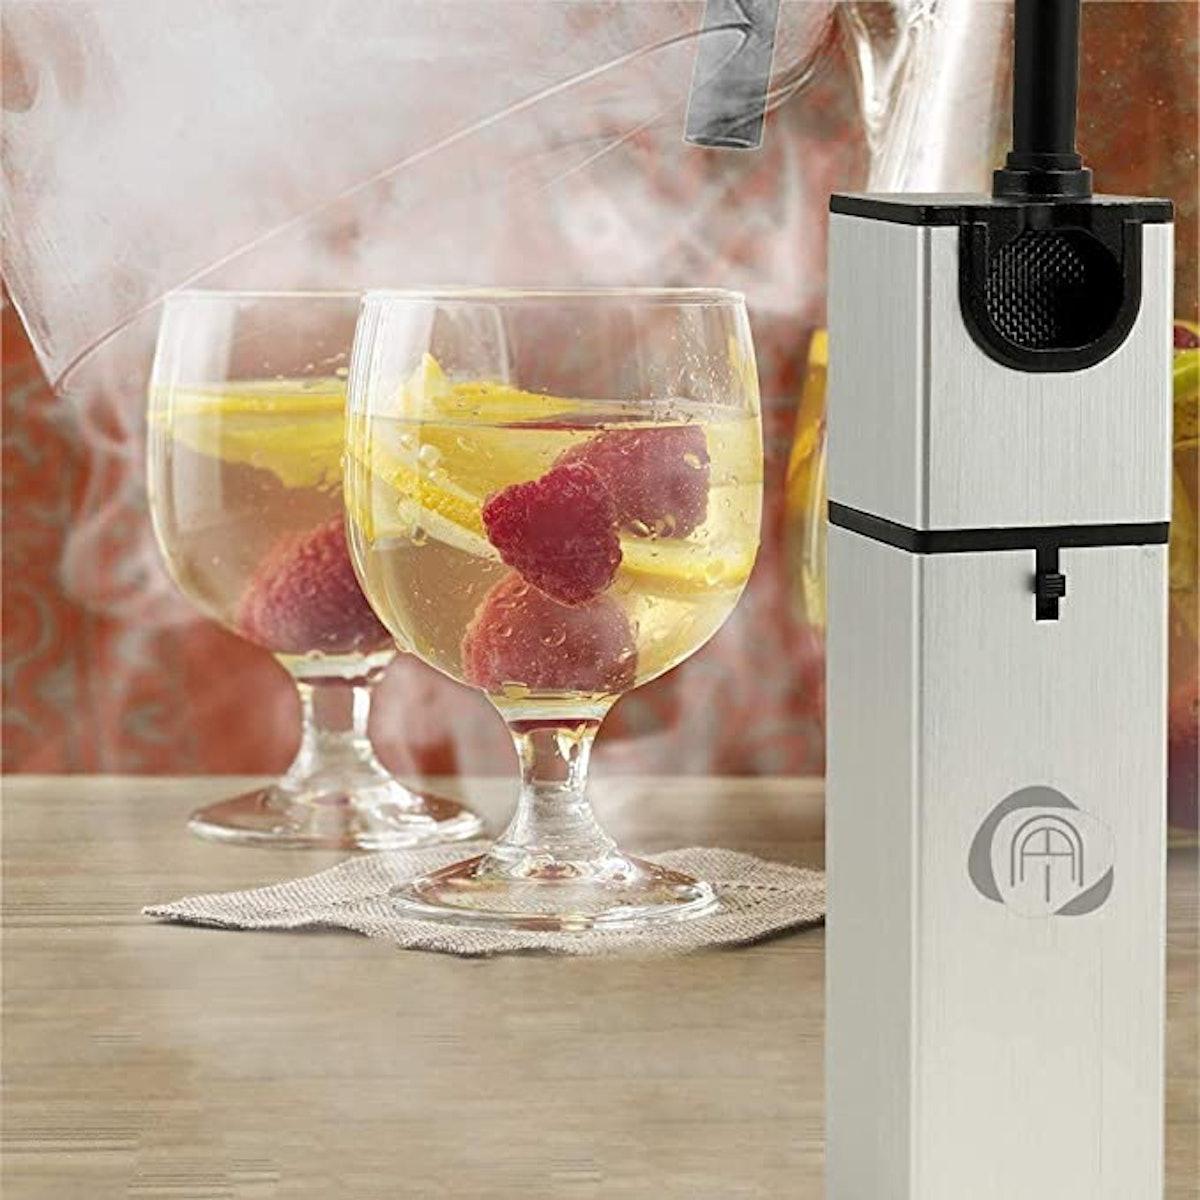 NIA Portable Smoke Infuser